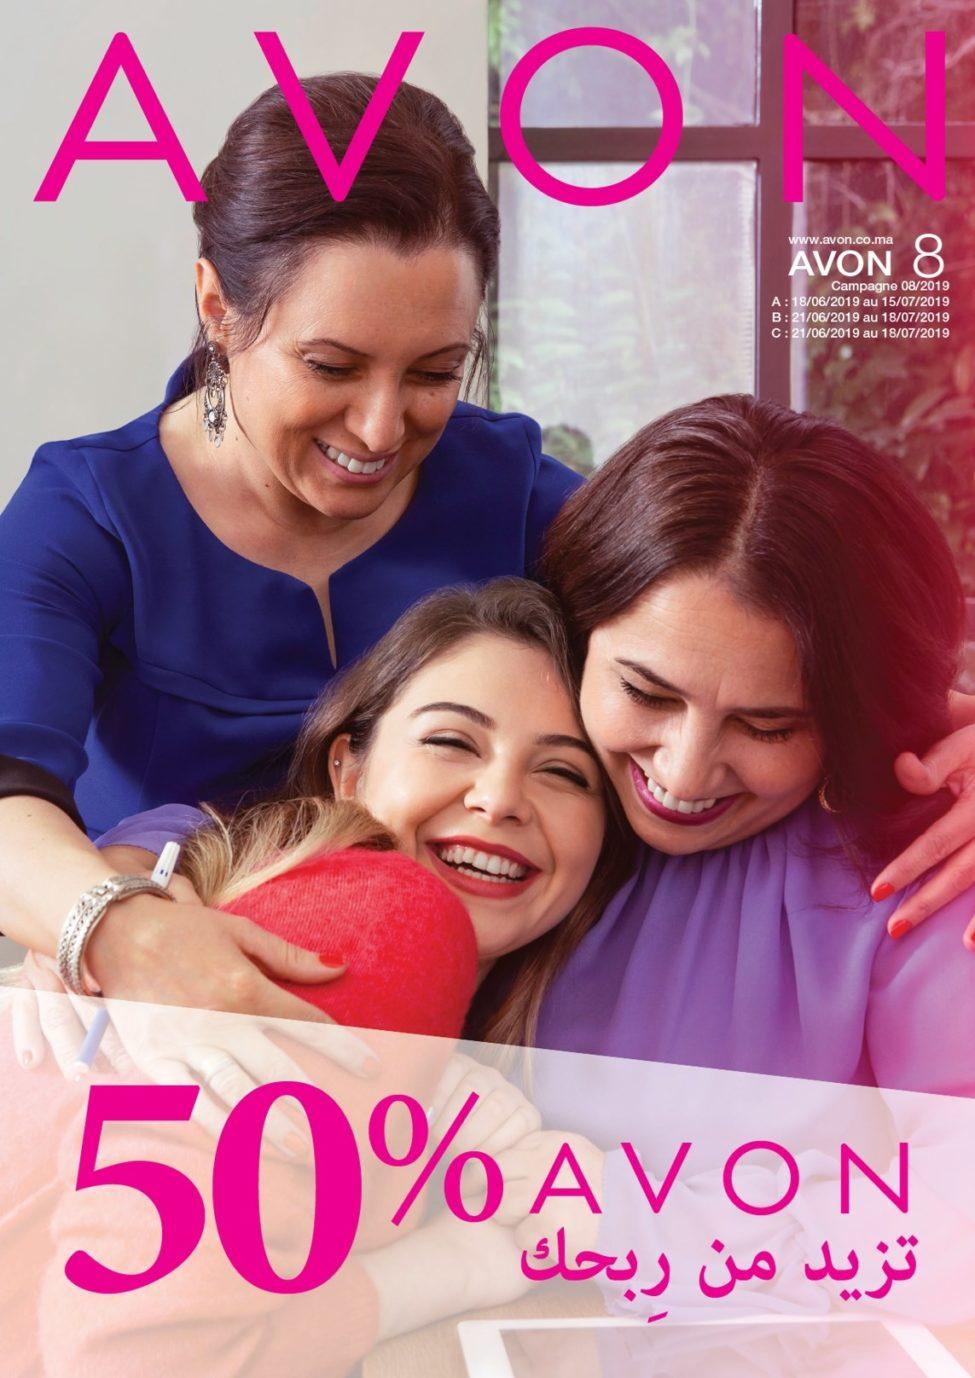 Flyer Avon Maroc du 18 Juin au 15 Juillet 2019